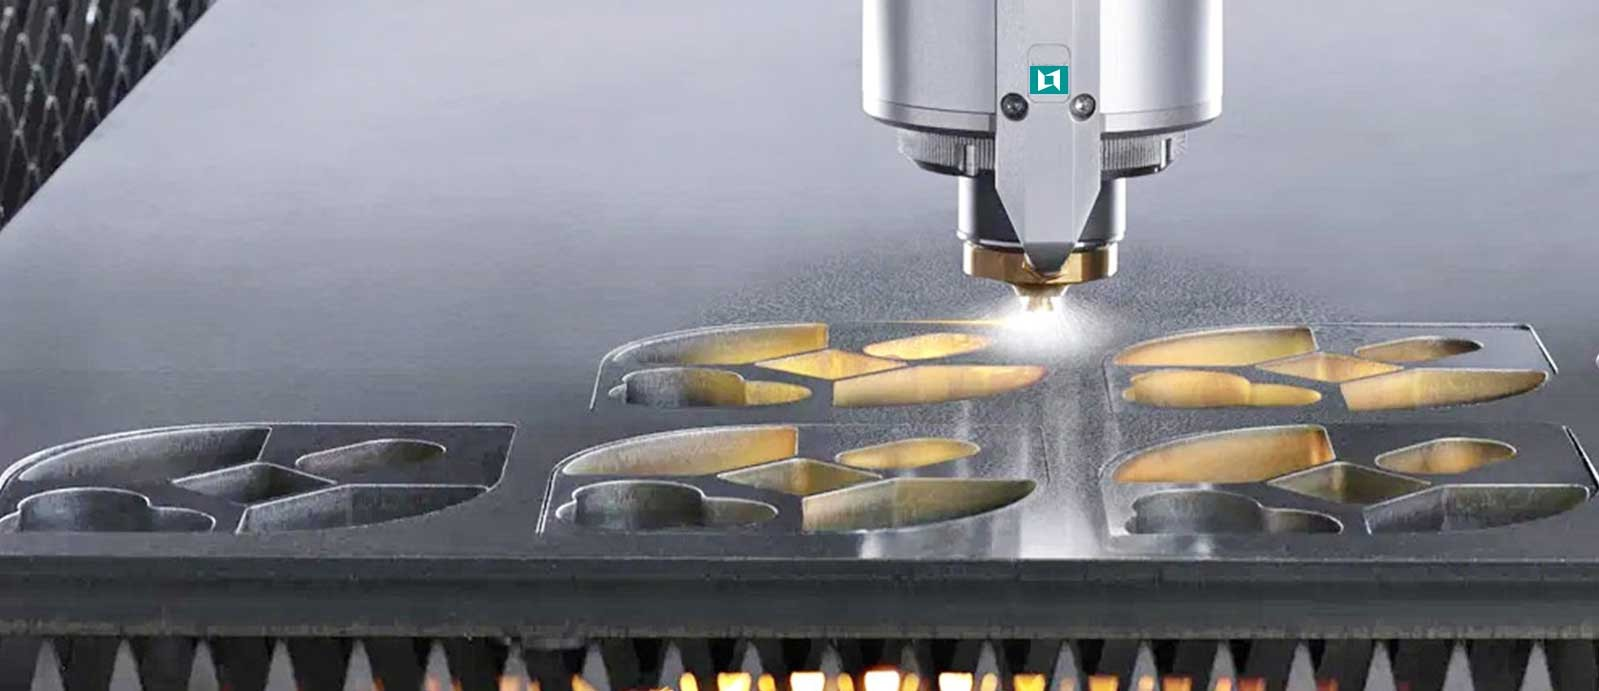 Metal cutter laser samples